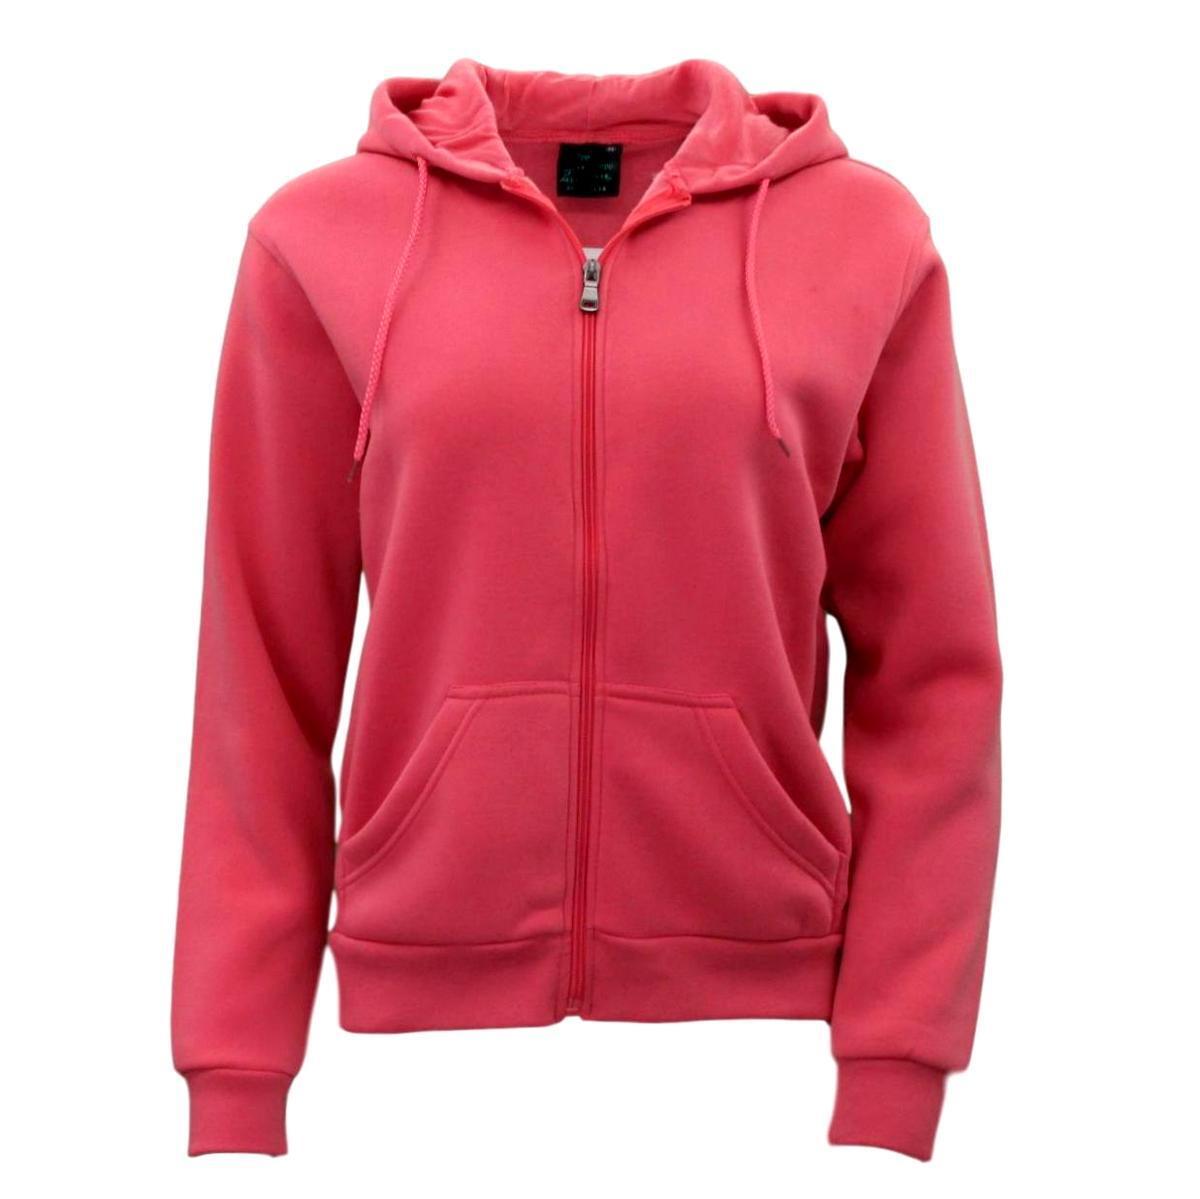 Adult-Unisex-Men-039-s-Zip-Up-Hoodie-w-Fleece-Hooded-Jacket-Jumper-Basic-Blank-Plain thumbnail 36